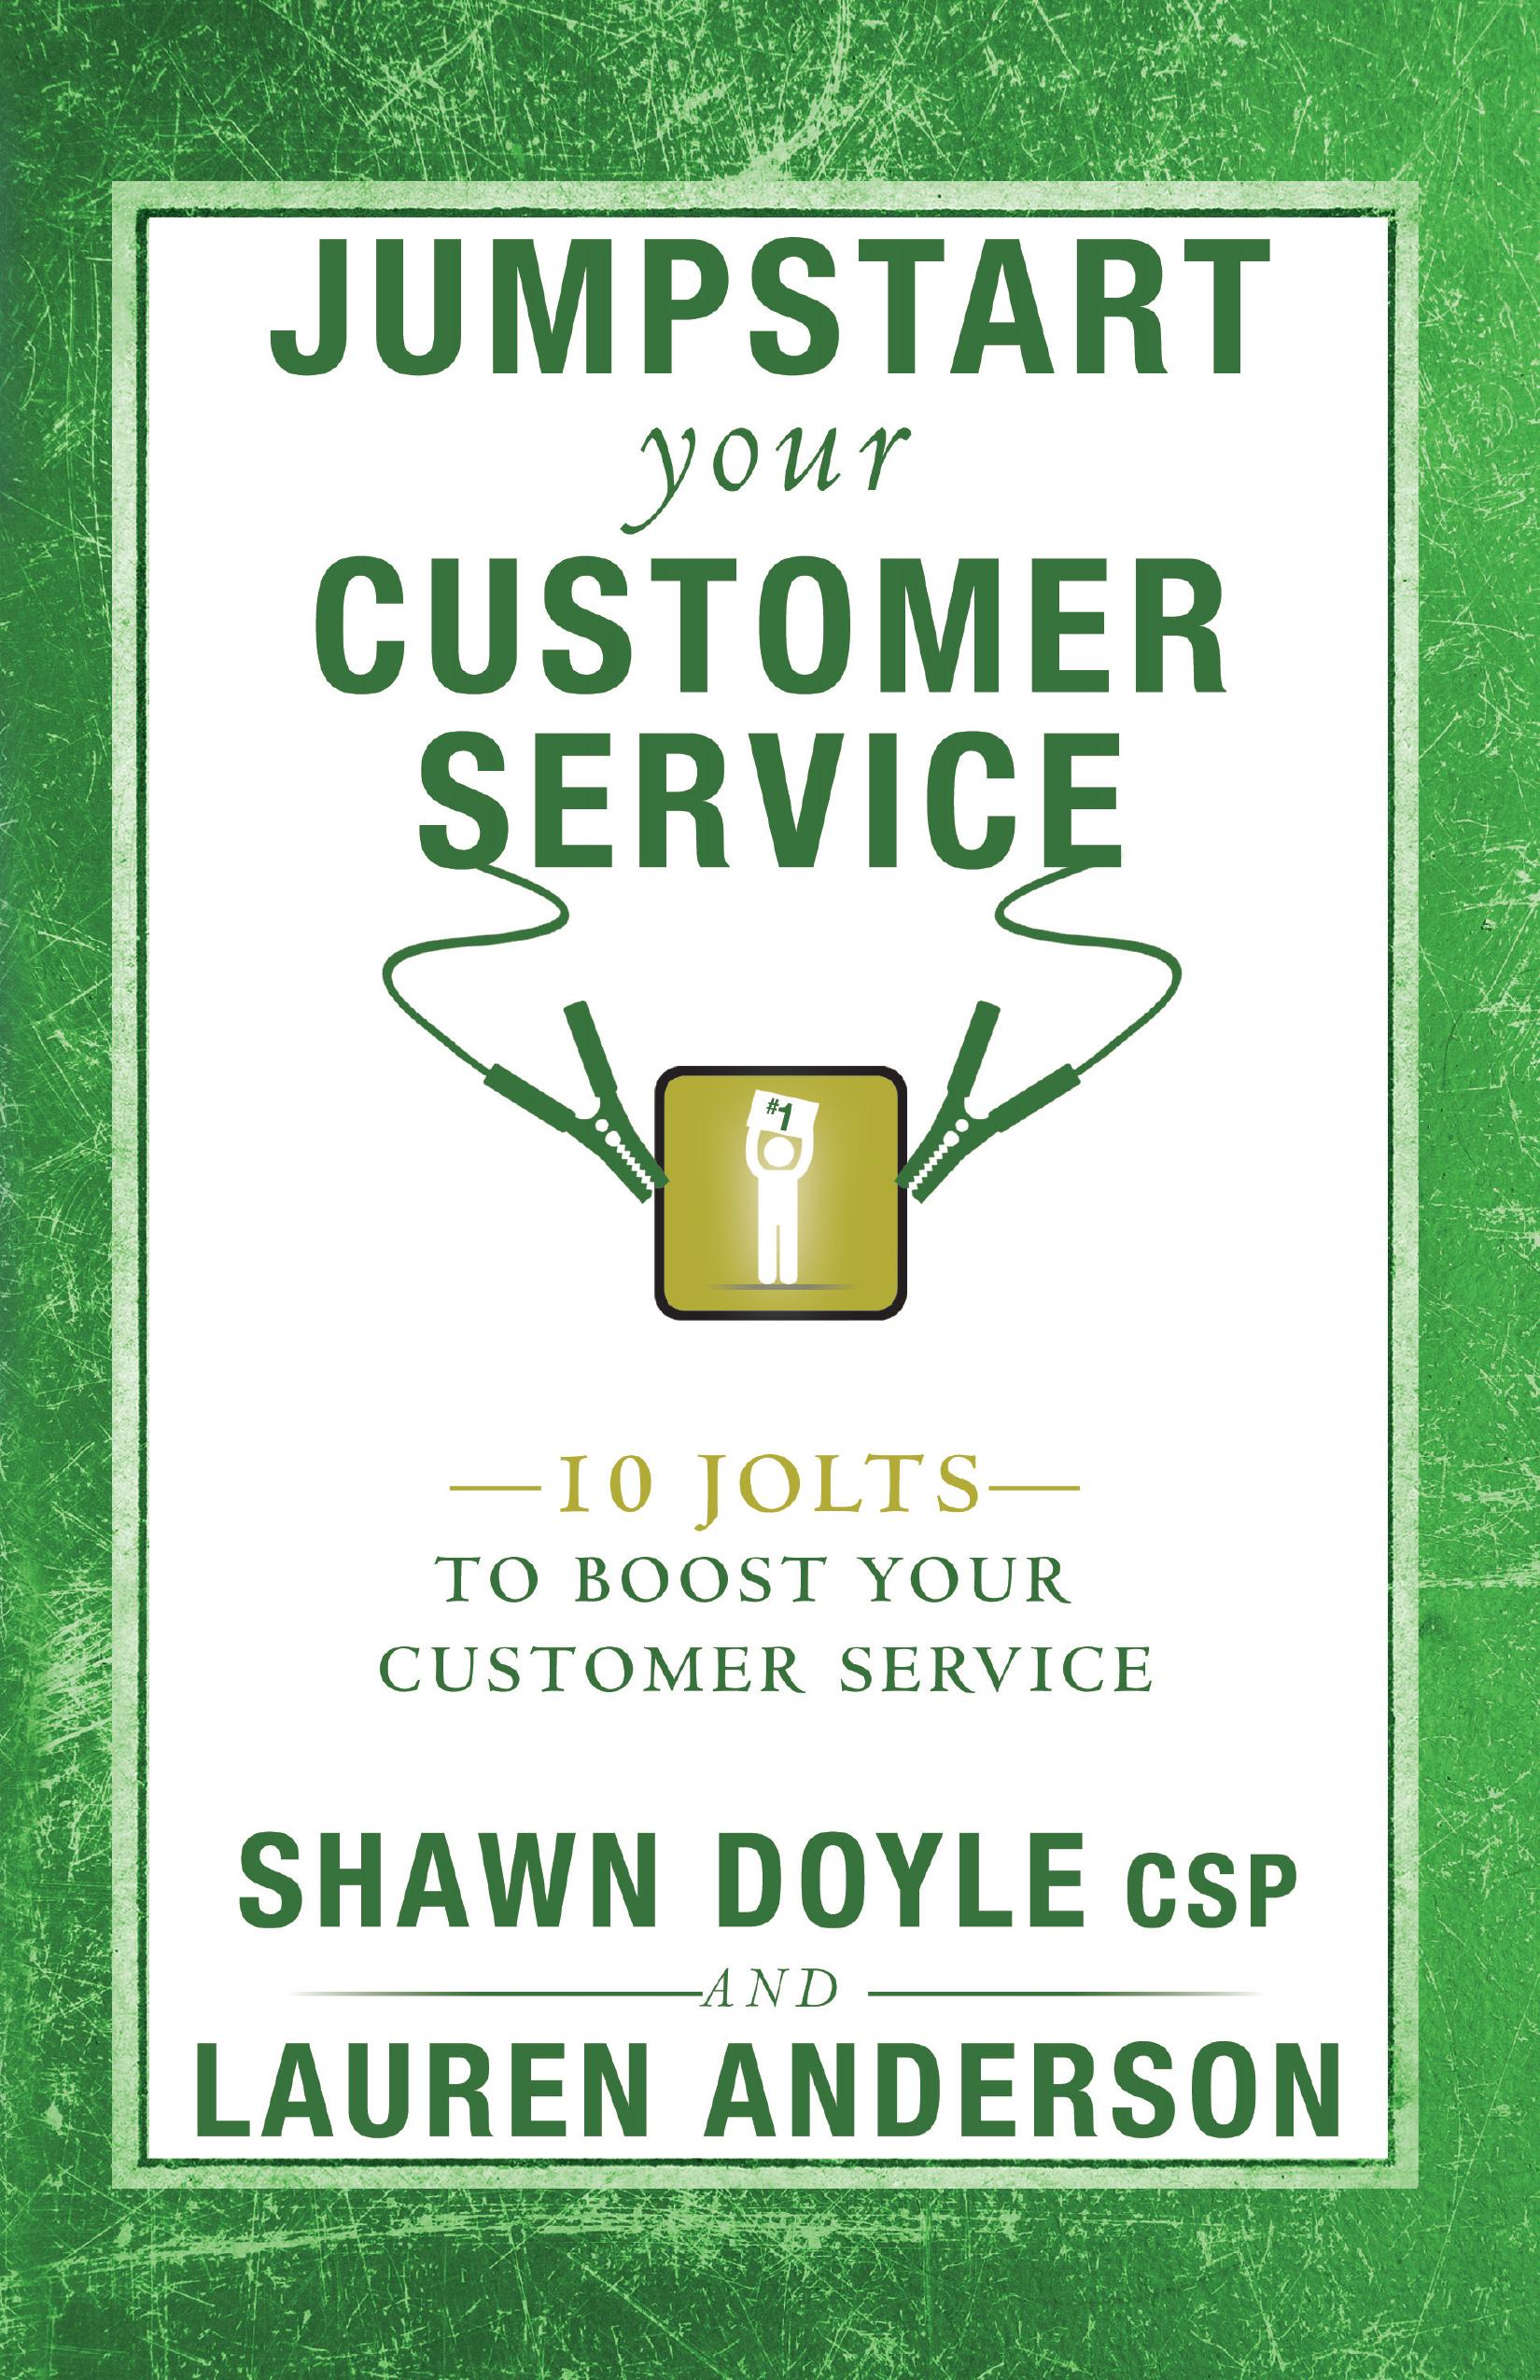 Jumpstart Your Customer Service - Shawn Doyle CSP & Lauren Anderson